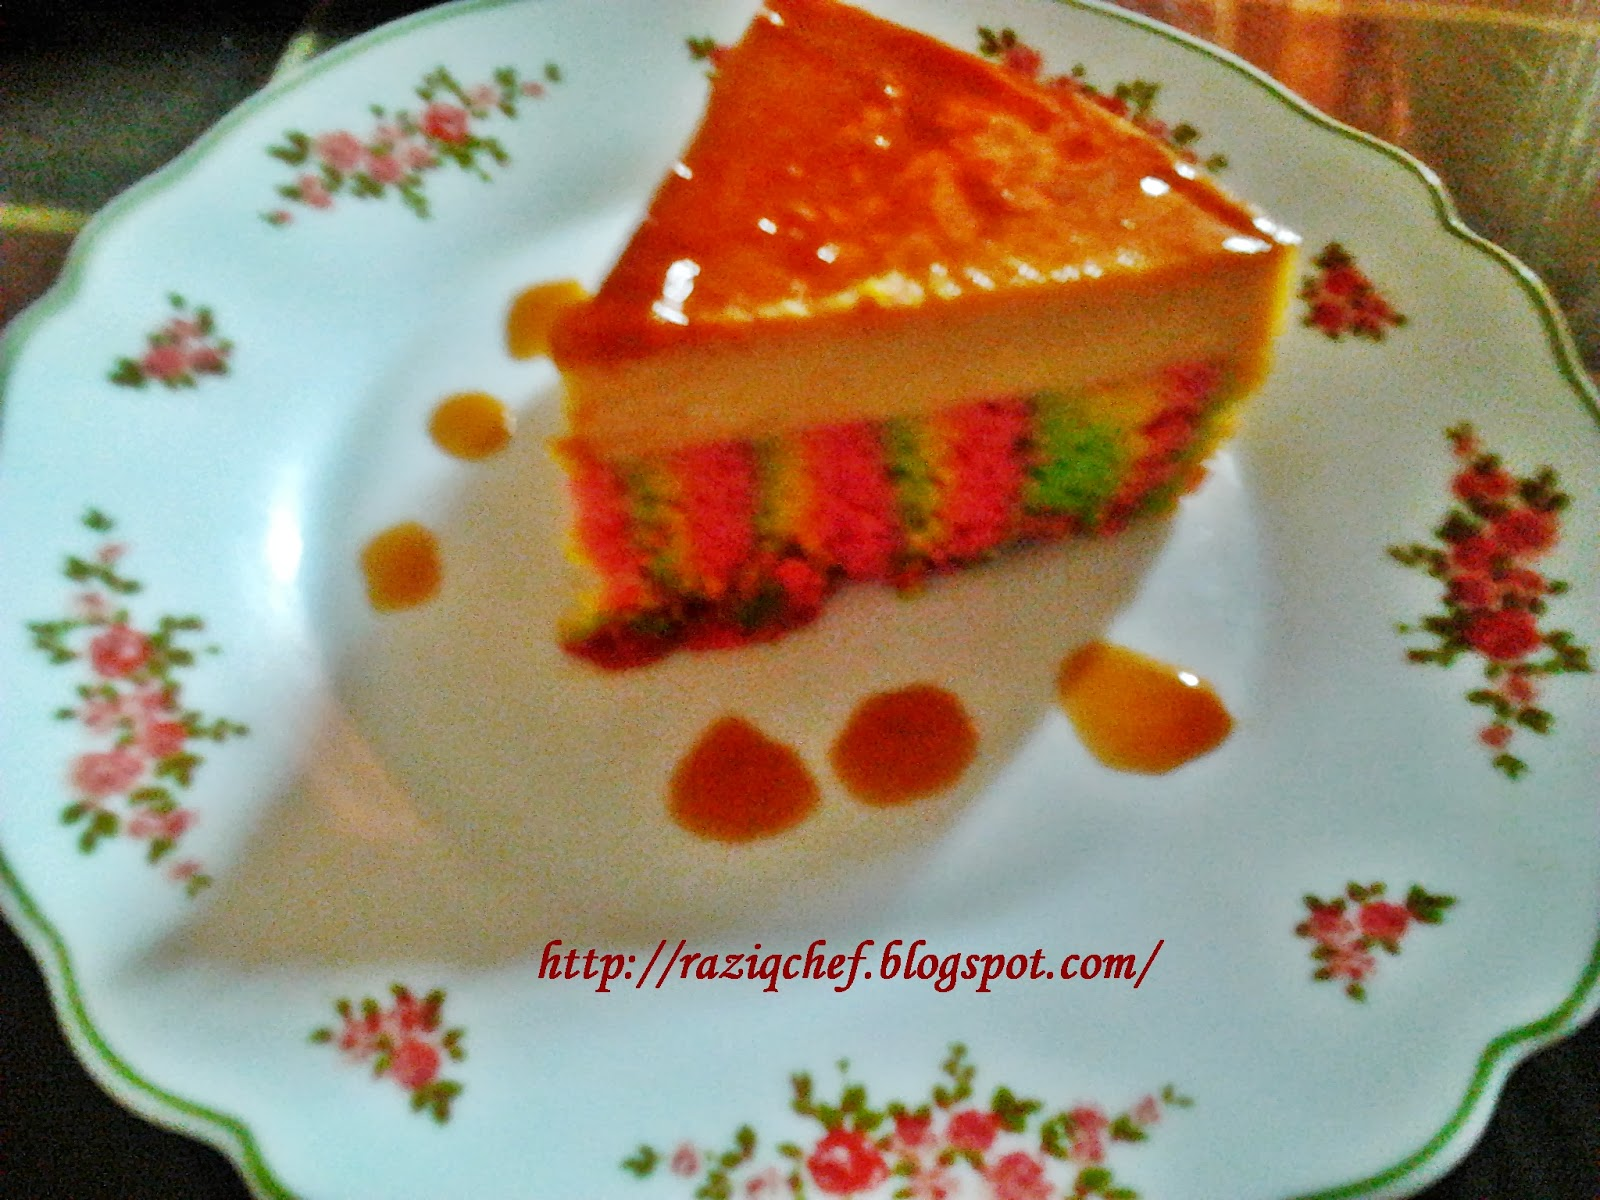 http://raziqchef.blogspot.com/